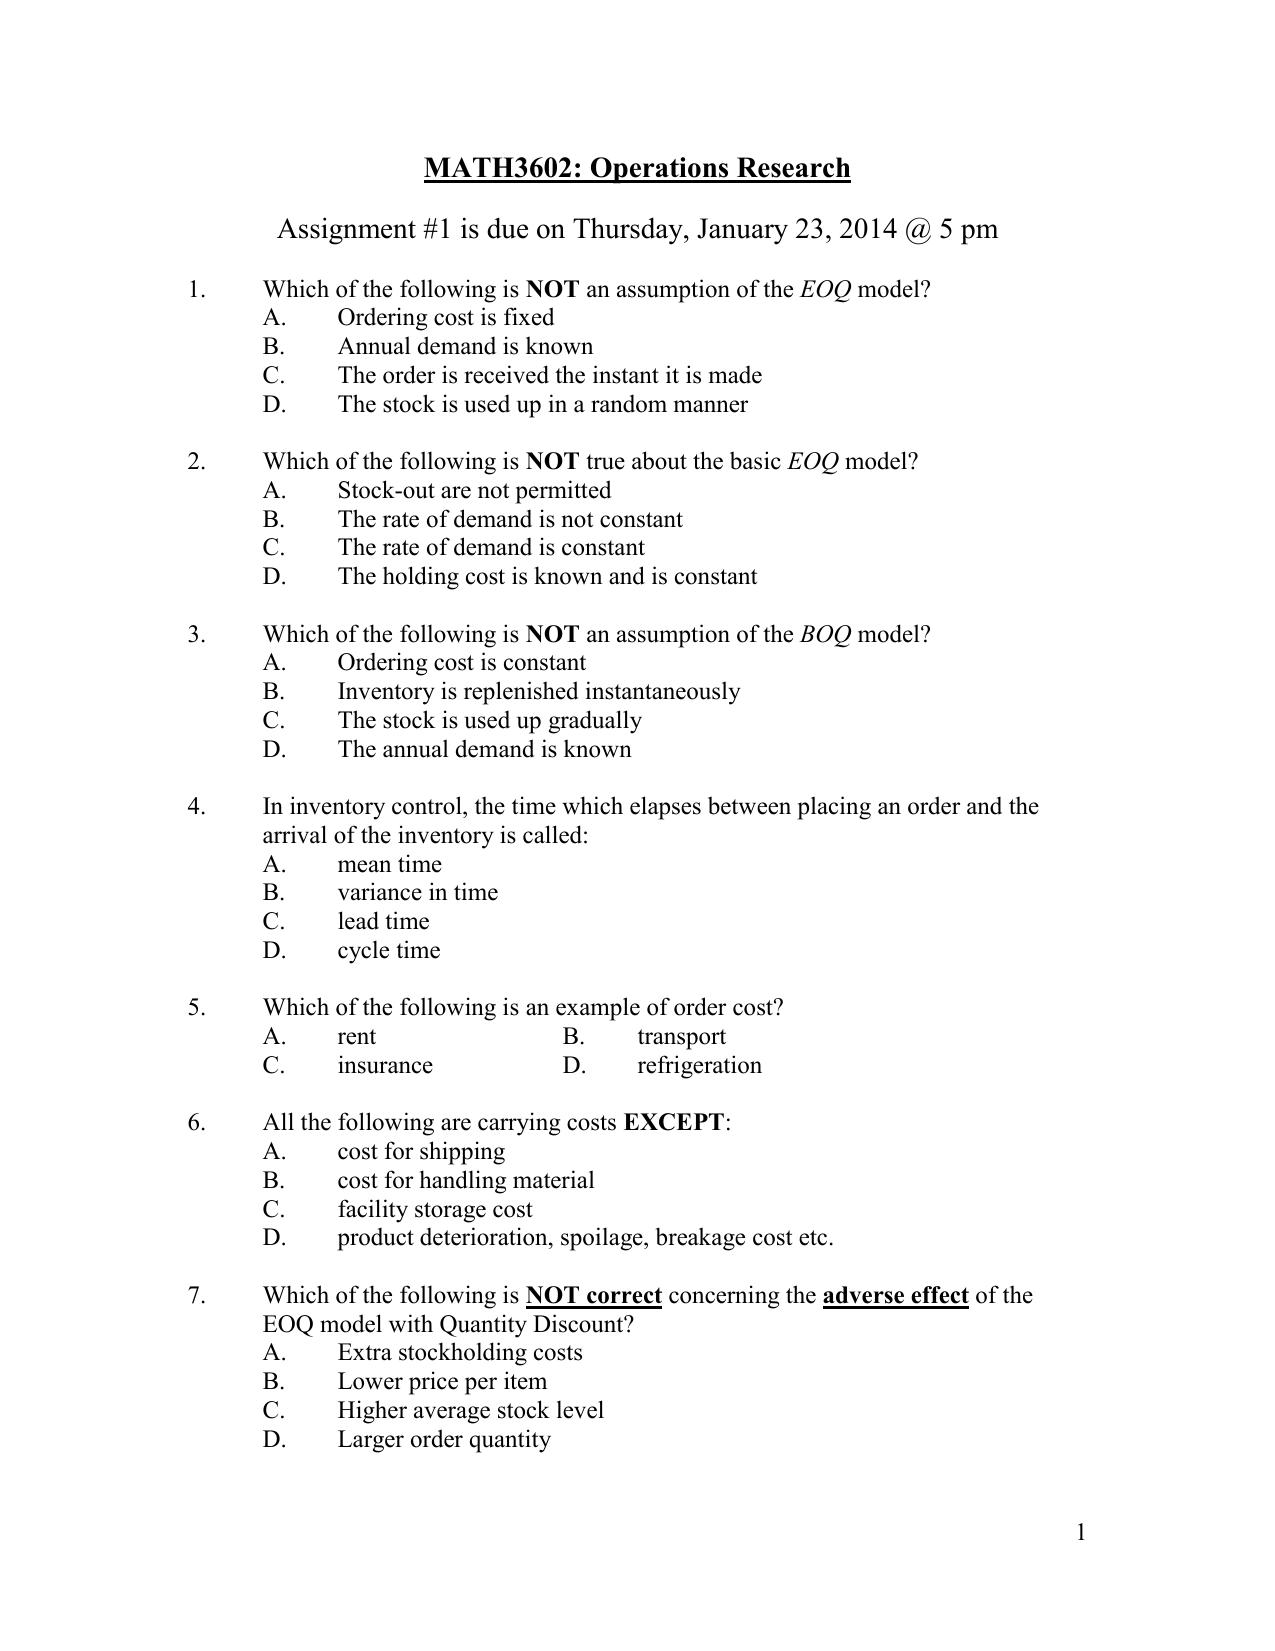 MTH2111: College Algebra